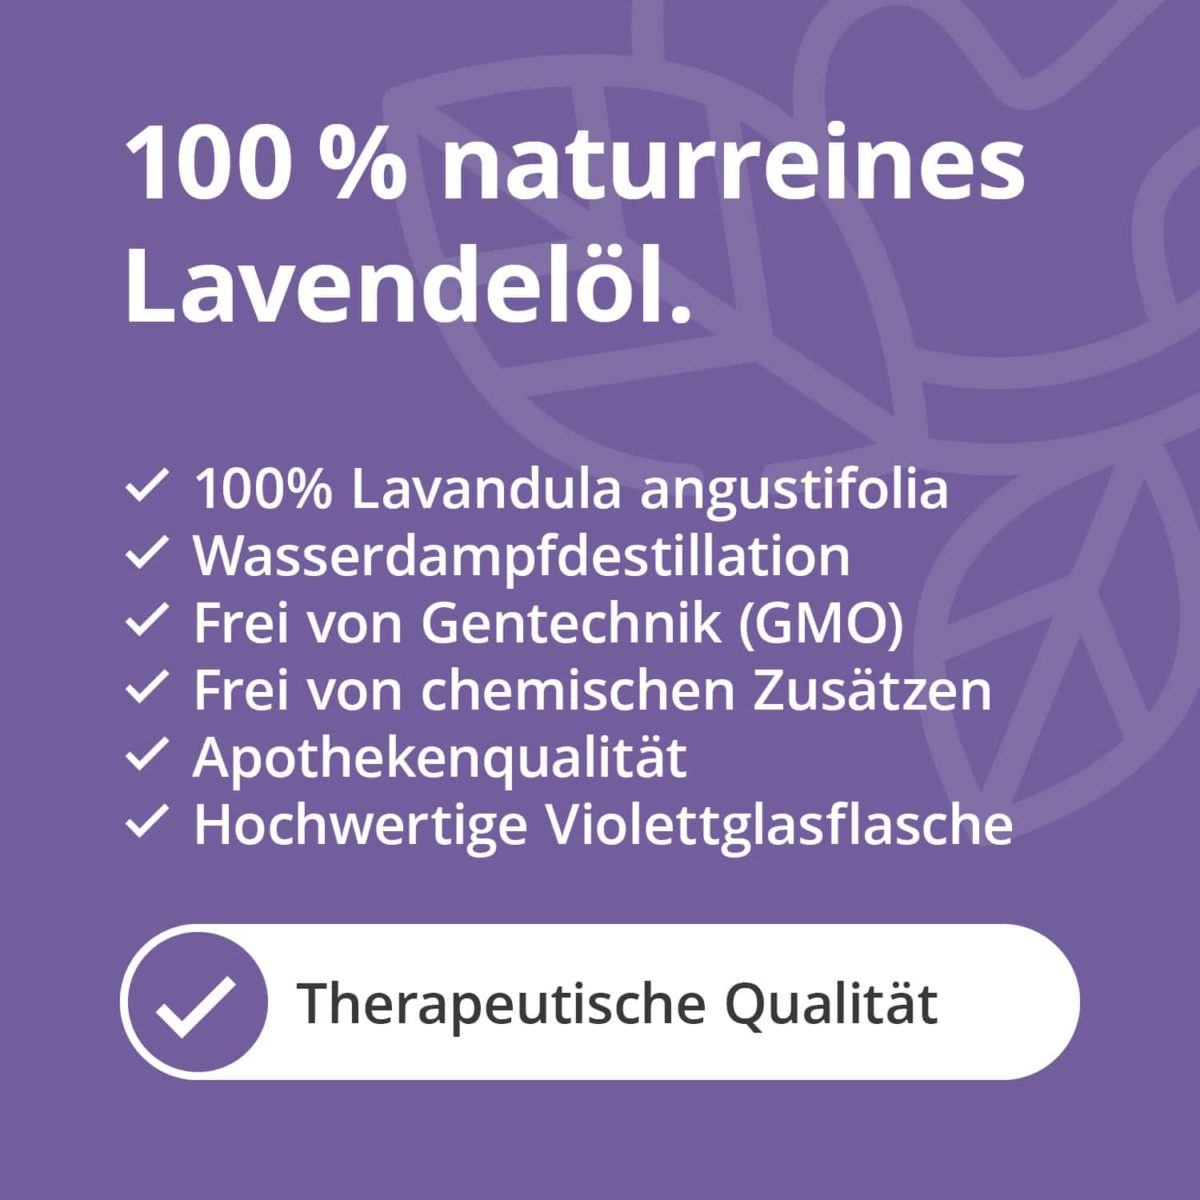 Casida Lavendelöl naturrein – 10 ml 15880722 PZN Apotheke Lavandula angustifolia Diffuser pur anwenden Schlaf Beruhigung (6)